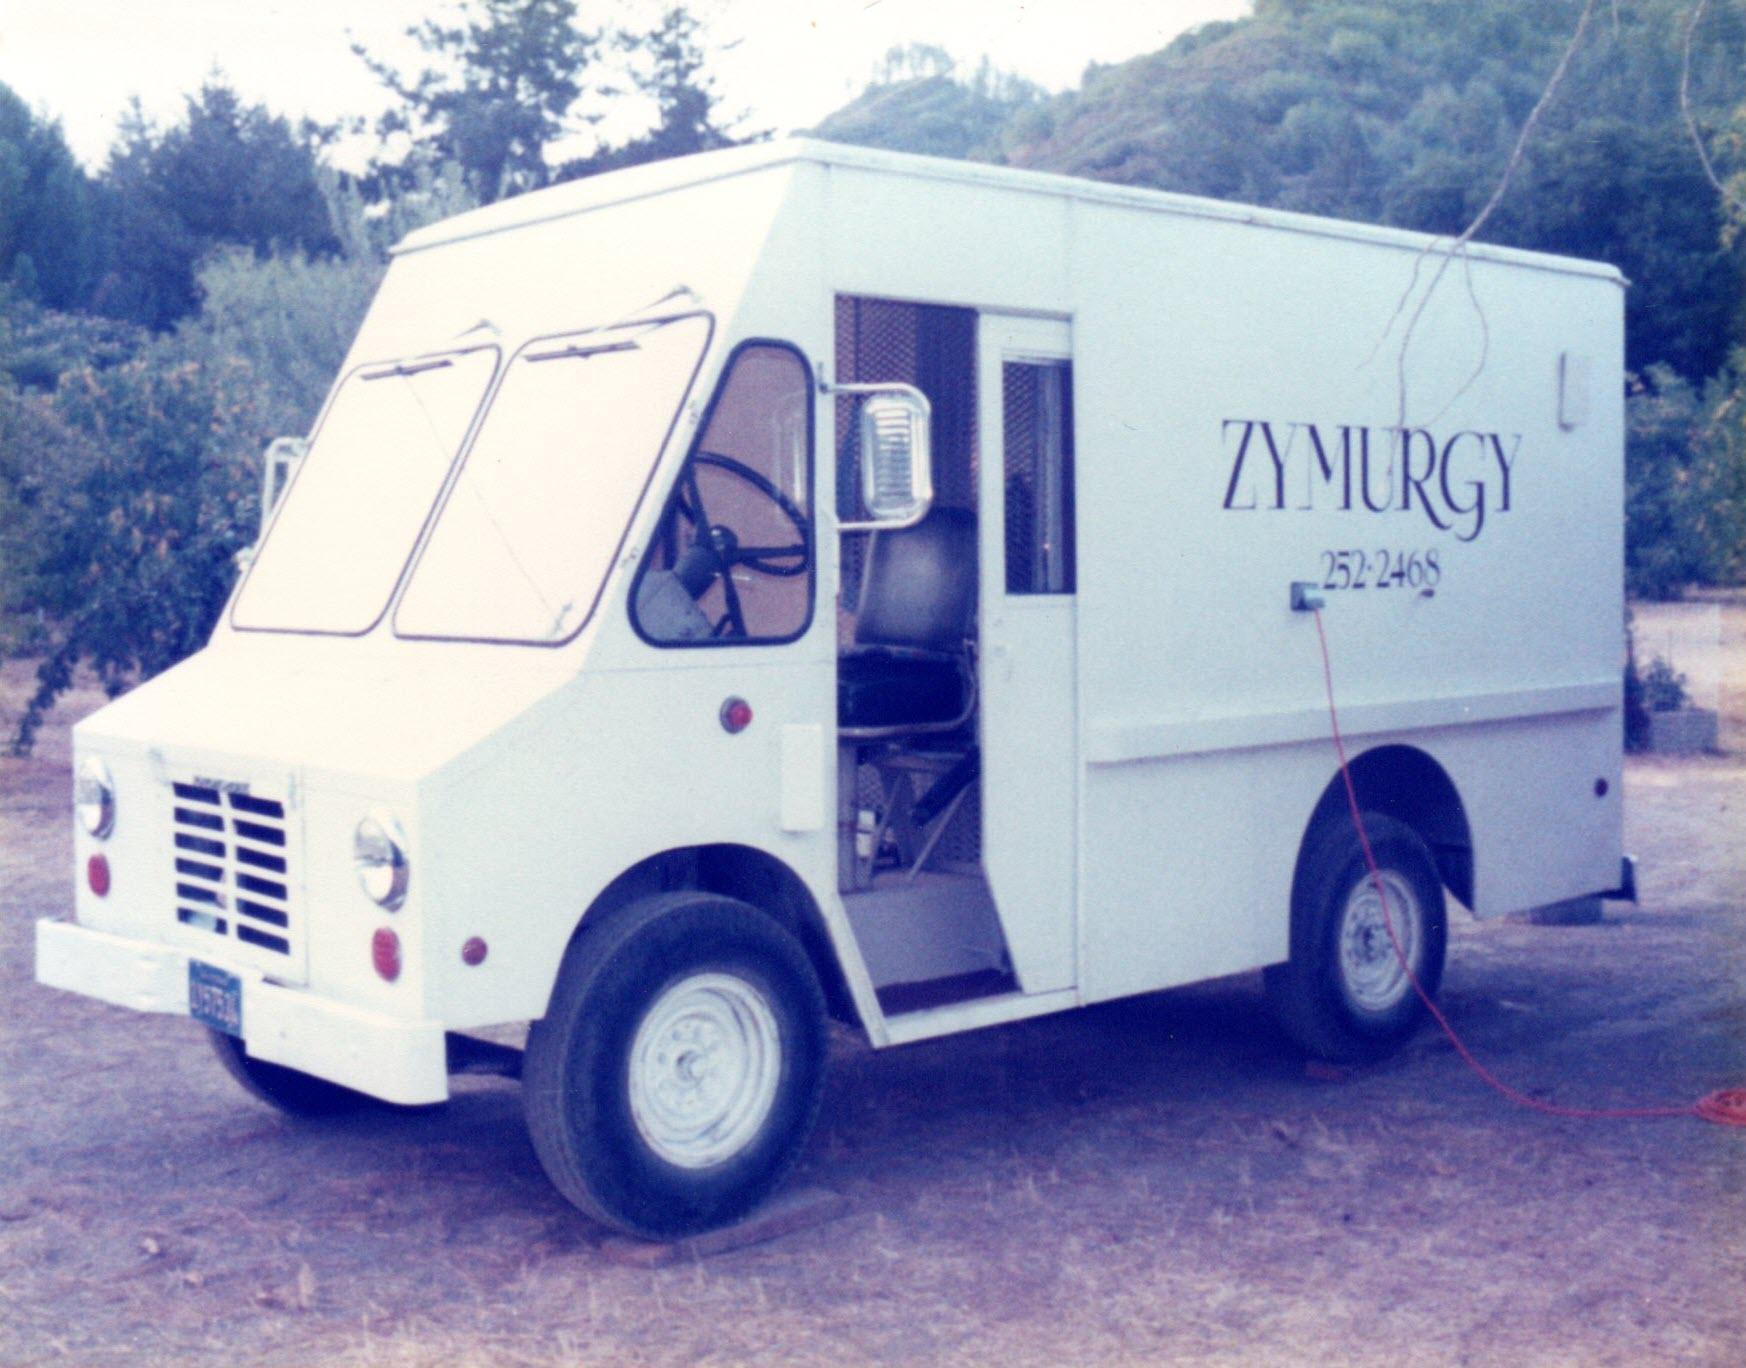 Zymurgy002